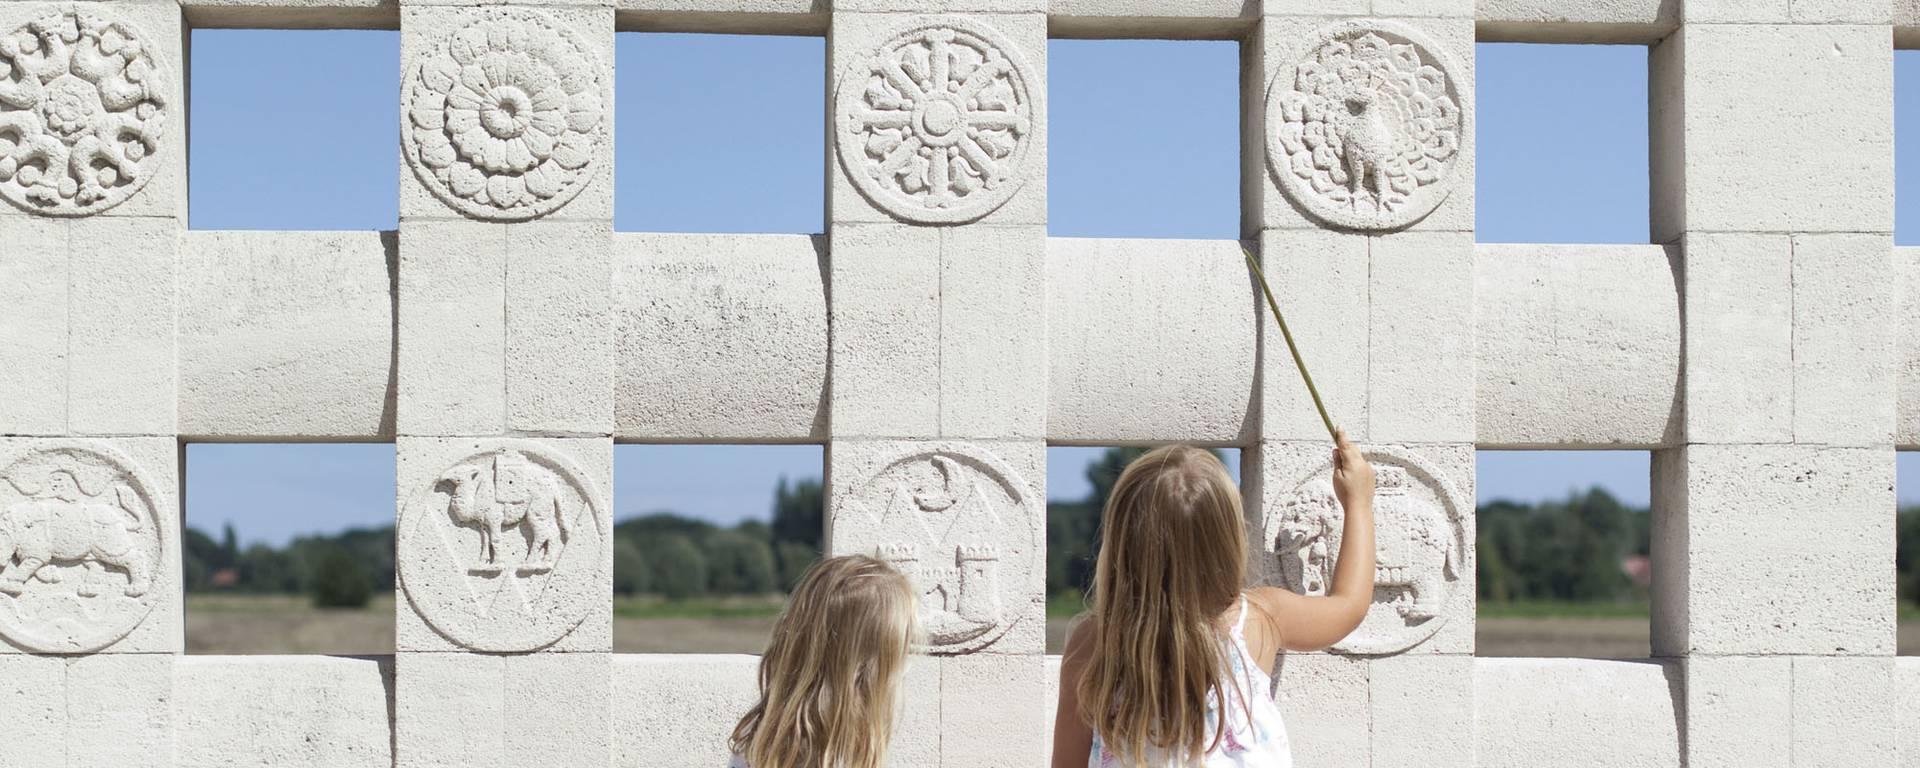 Neuve-Chapelle Indian Memorial - Richebourg © Brigitte Baudesson